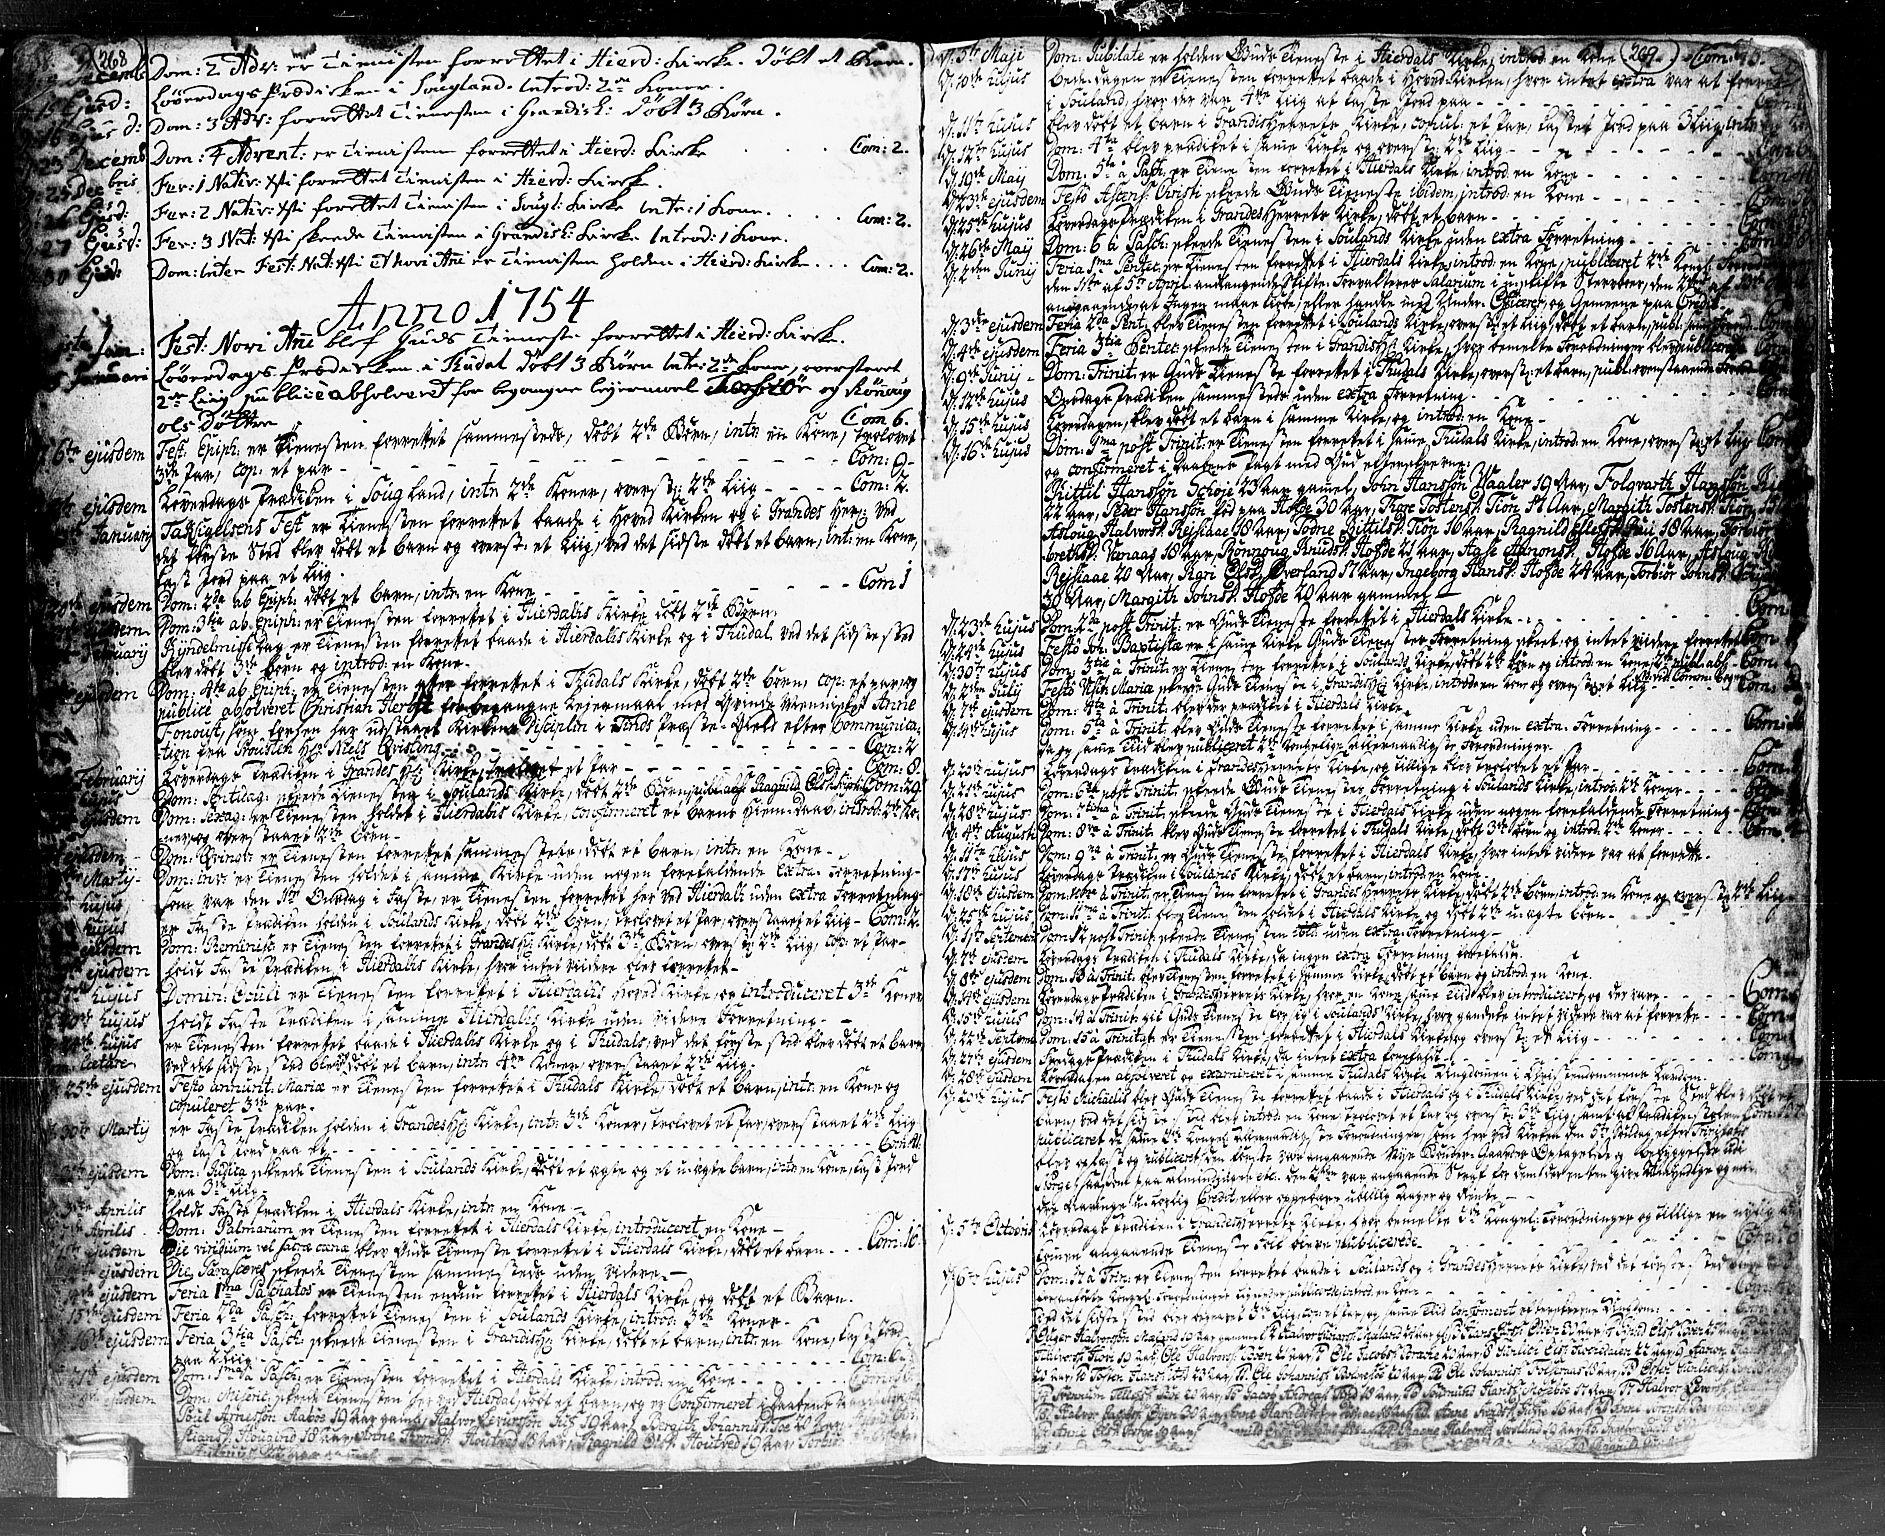 SAKO, Hjartdal kirkebøker, F/Fa/L0002: Ministerialbok nr. I 2, 1716-1754, s. 268-269